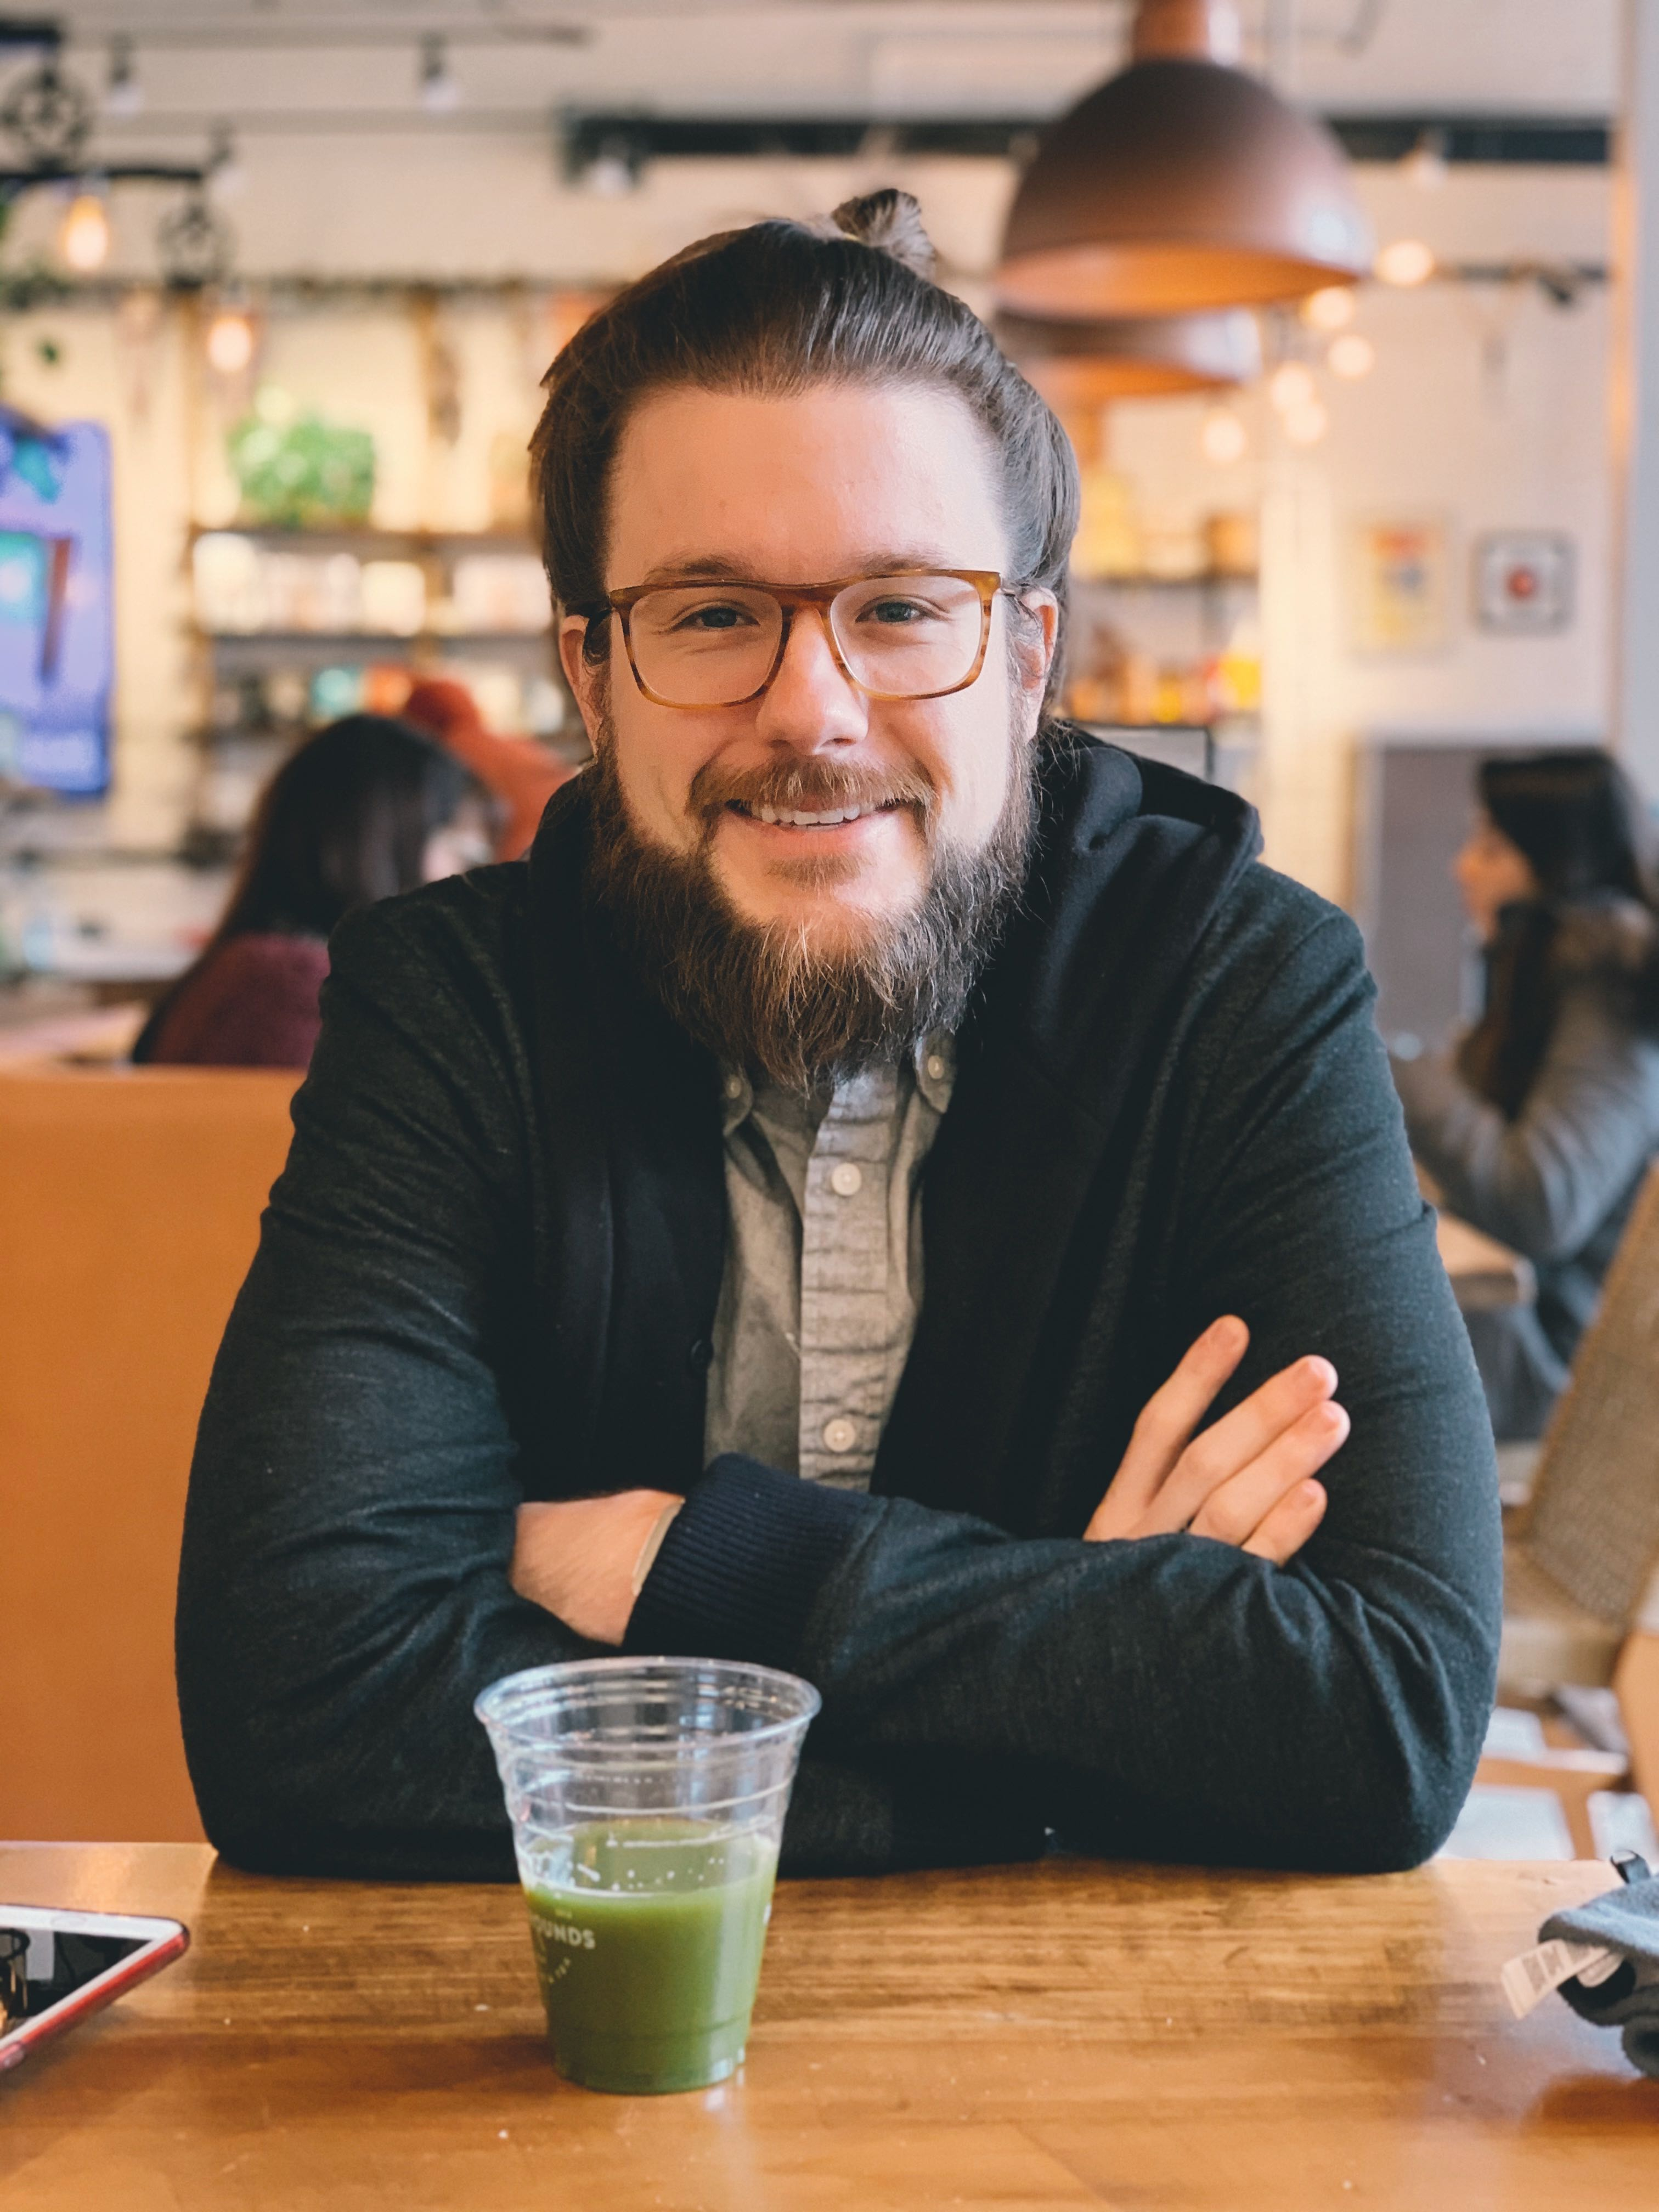 Charming photograph of Range employee, Noah Jeffrey having coffee